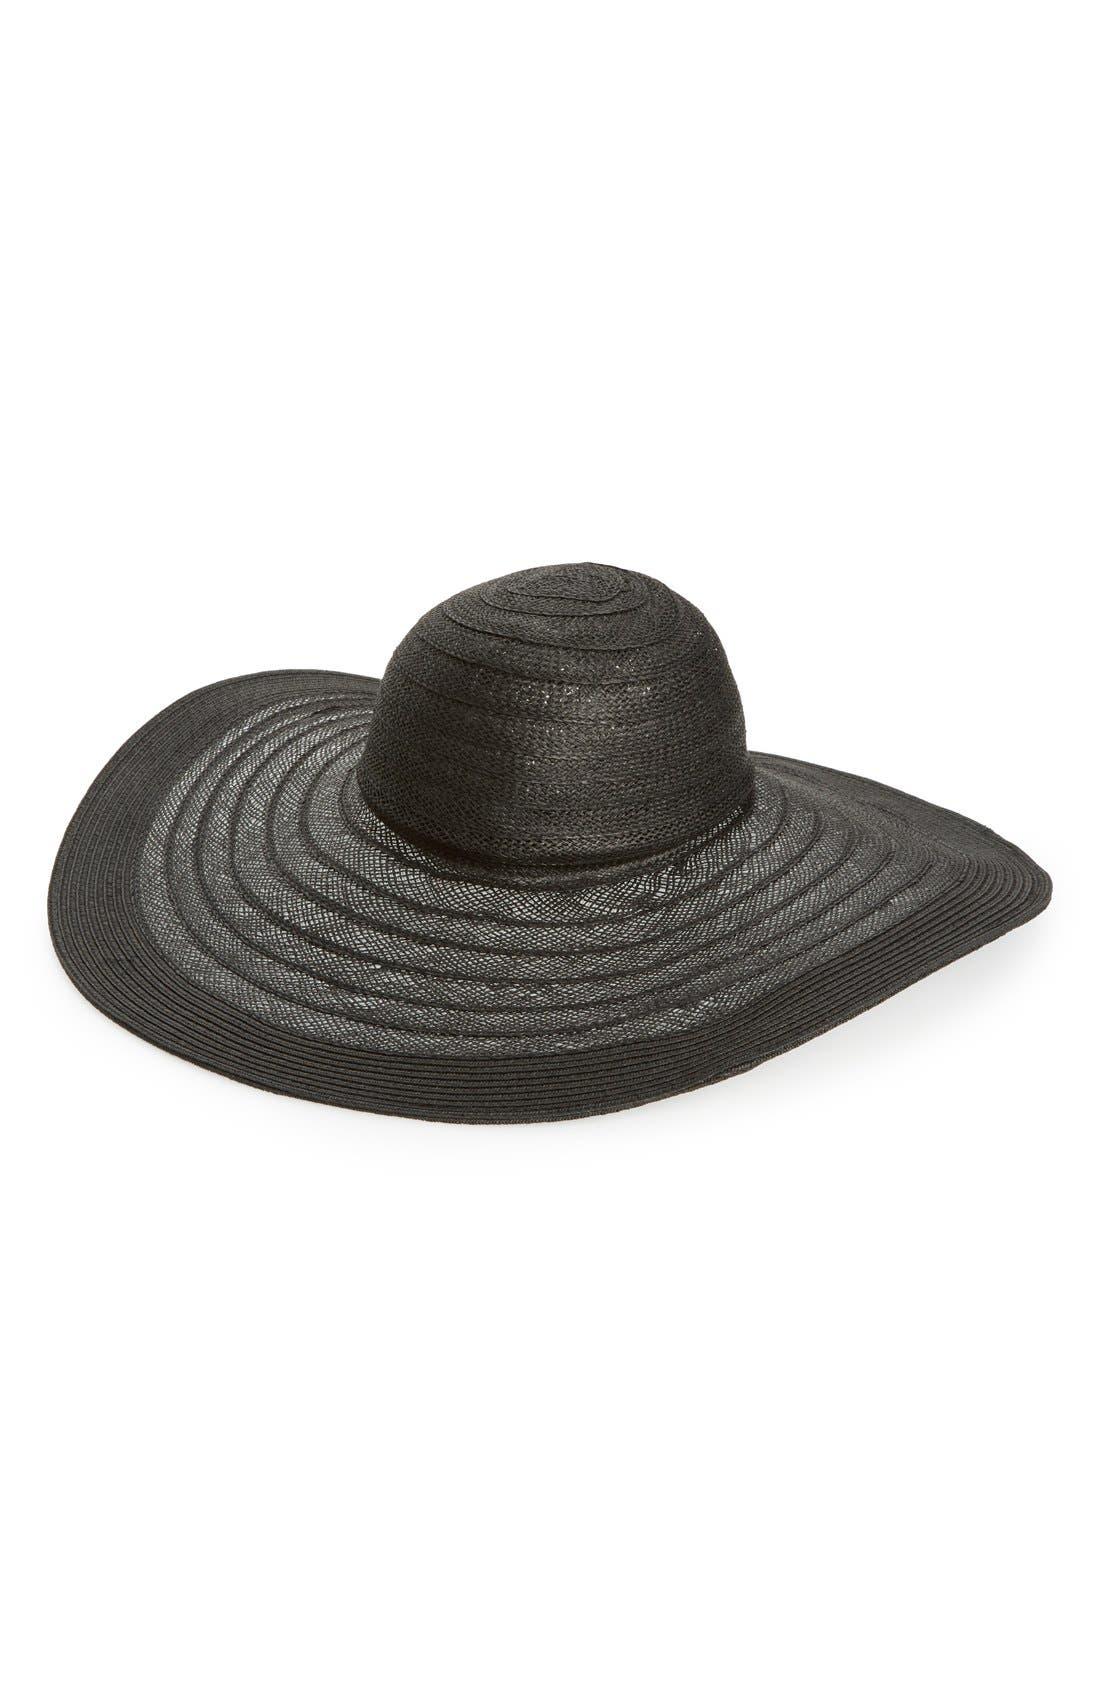 Main Image - Nordstrom Floppy Straw Hat